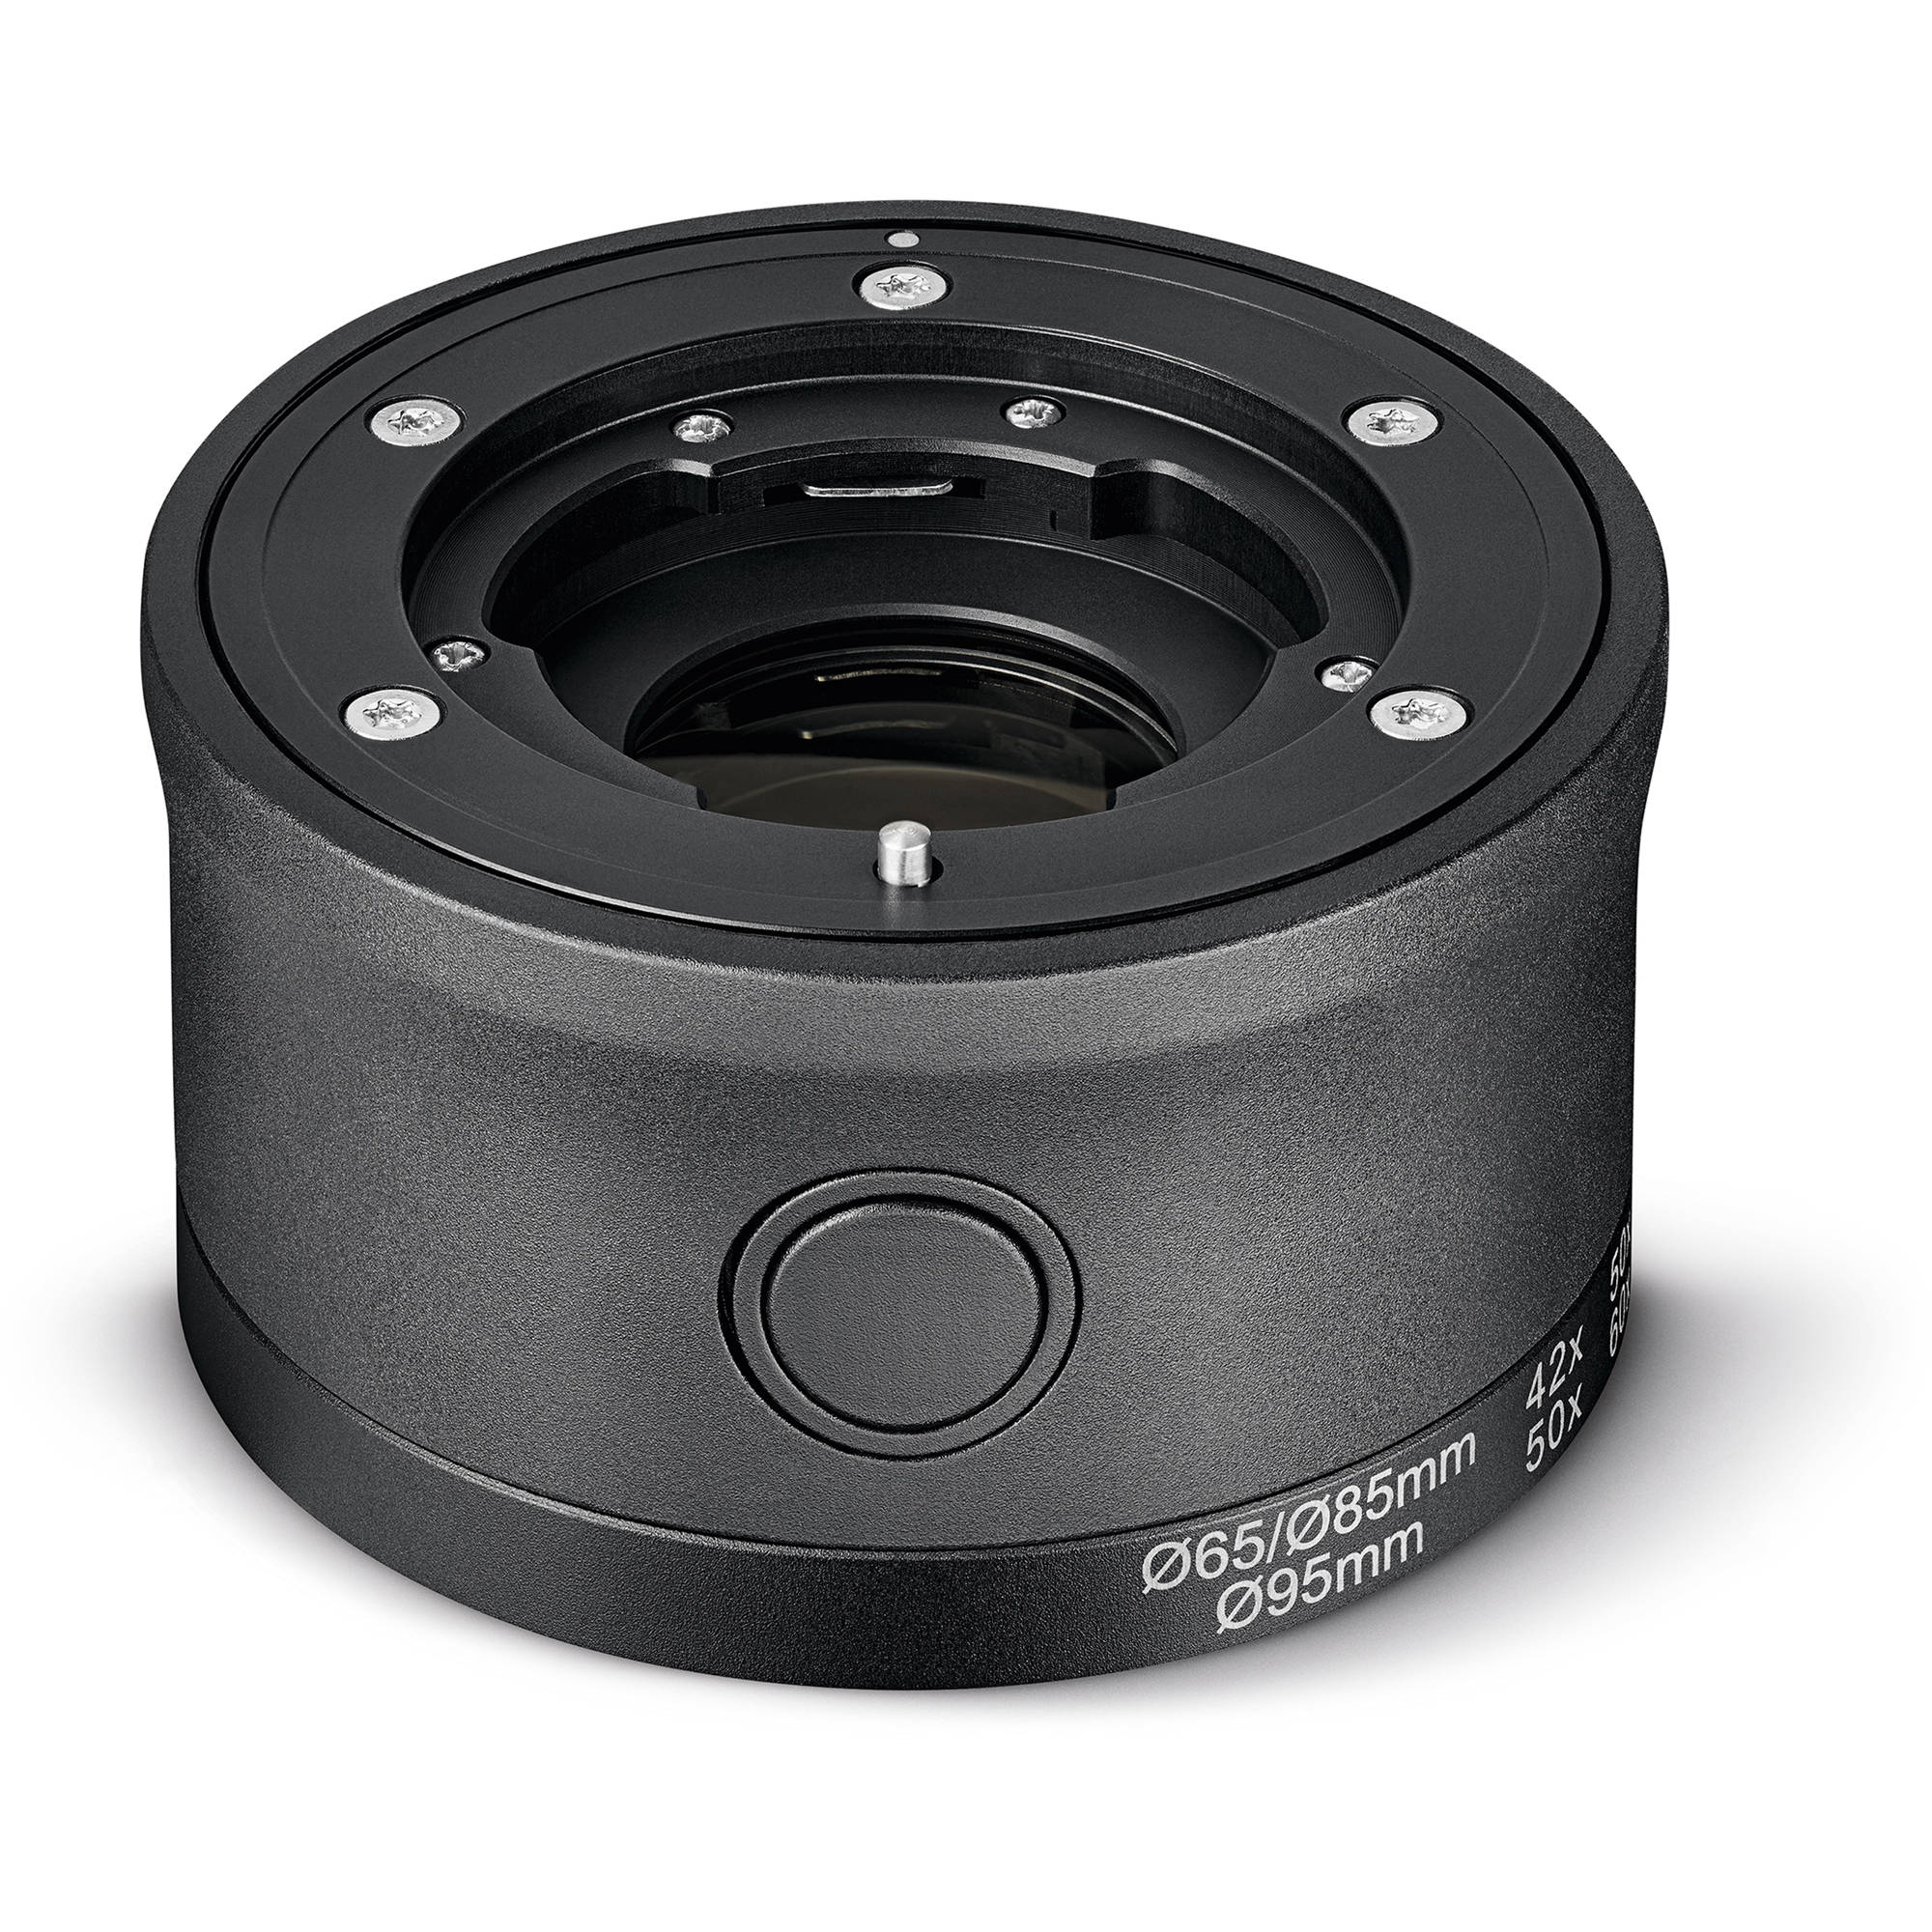 7d1a6848e1 Swarovski 1.7x Magnification Extender for ATX/STX/BTX Spotting Scopes